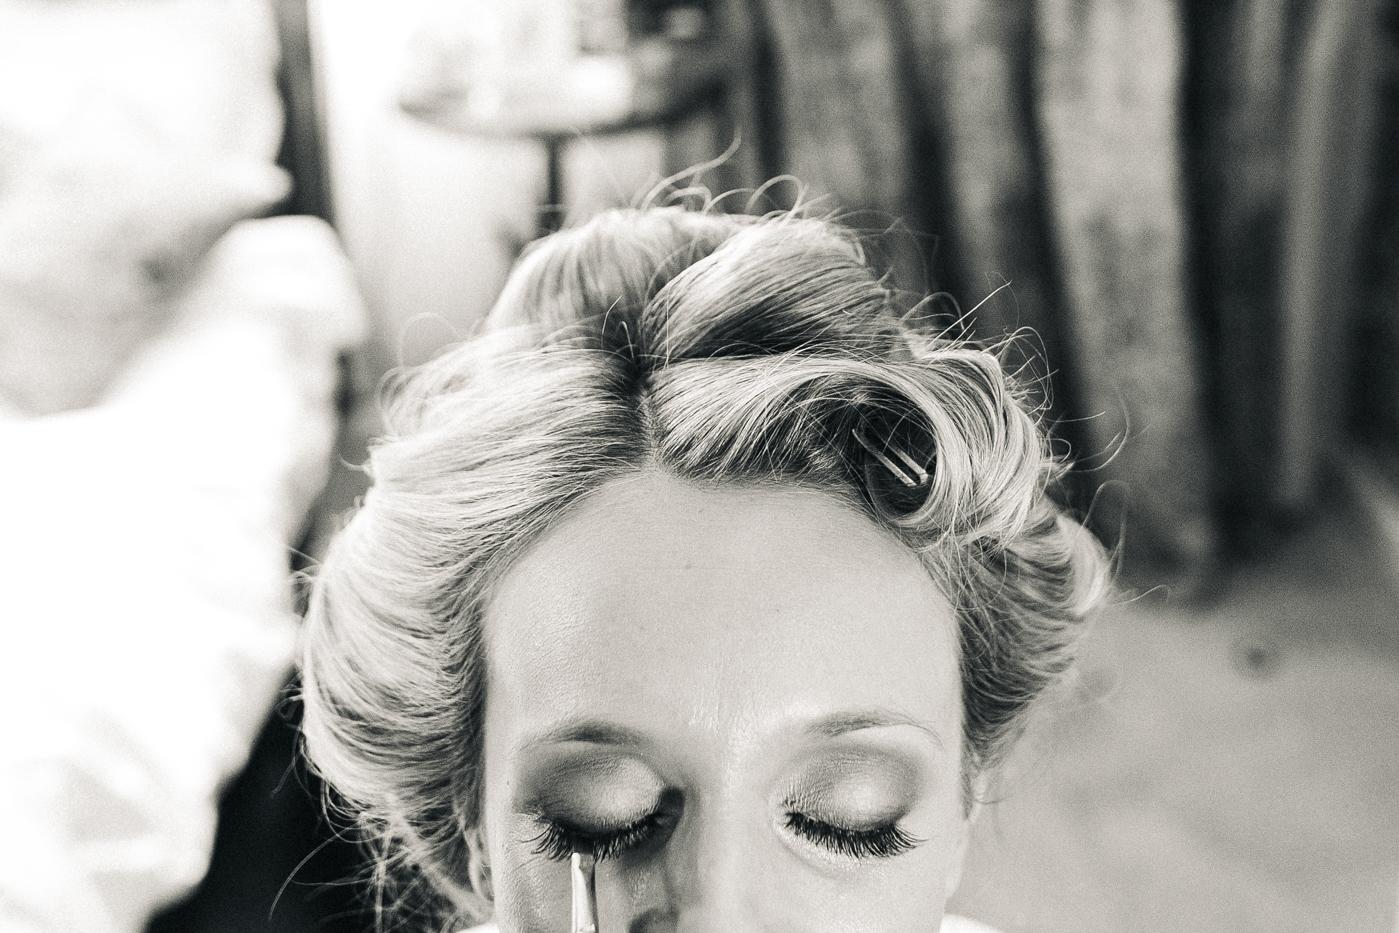 creative-wedding-photography-teesside-north-east-yorkshire-117.jpg